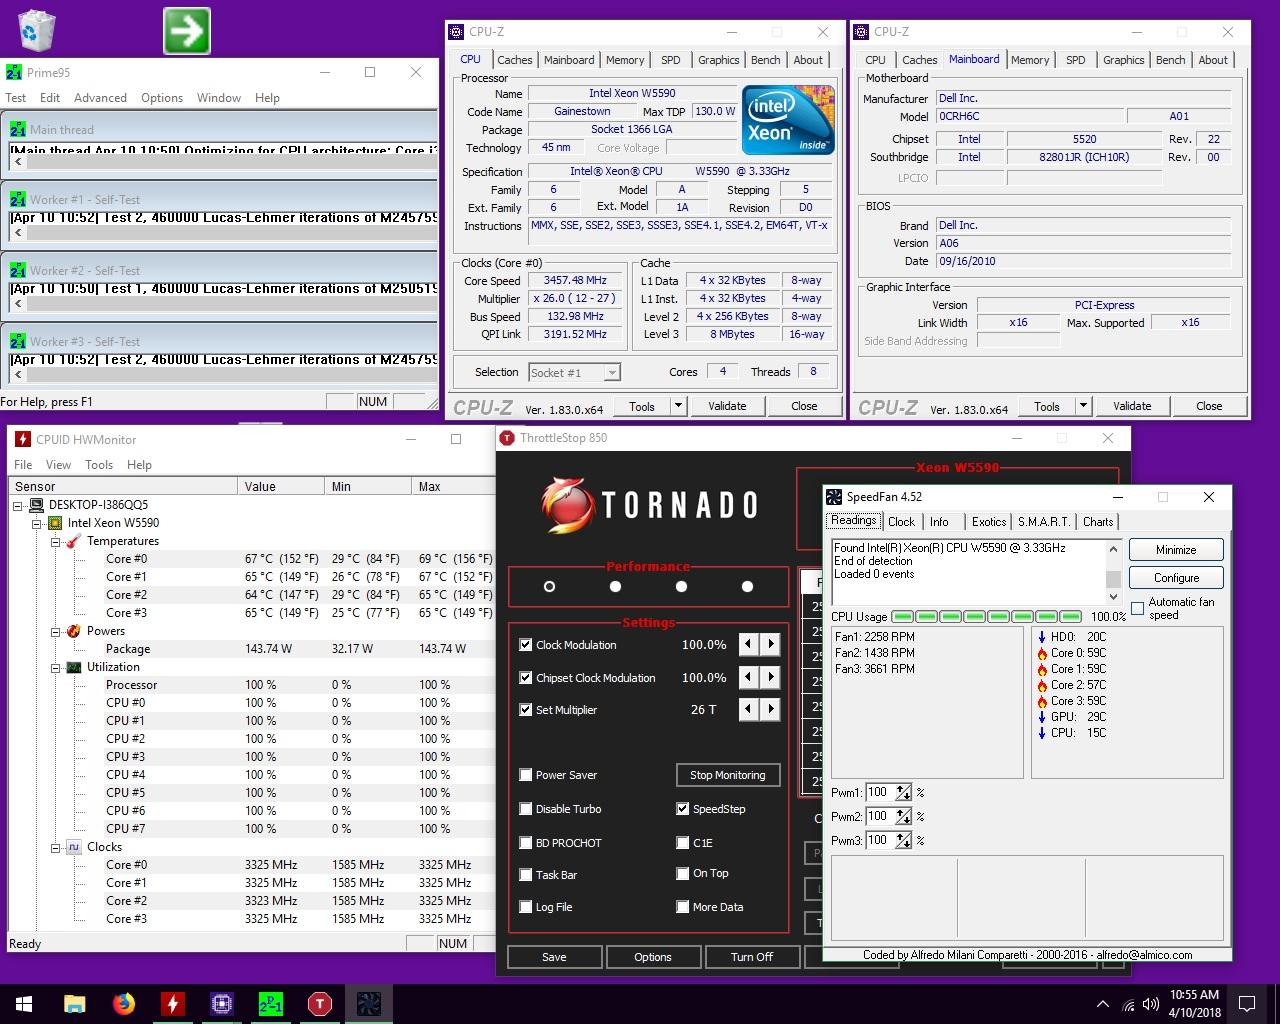 Throttlestop overclocking Desktop PCs | Page 9 | TechPowerUp